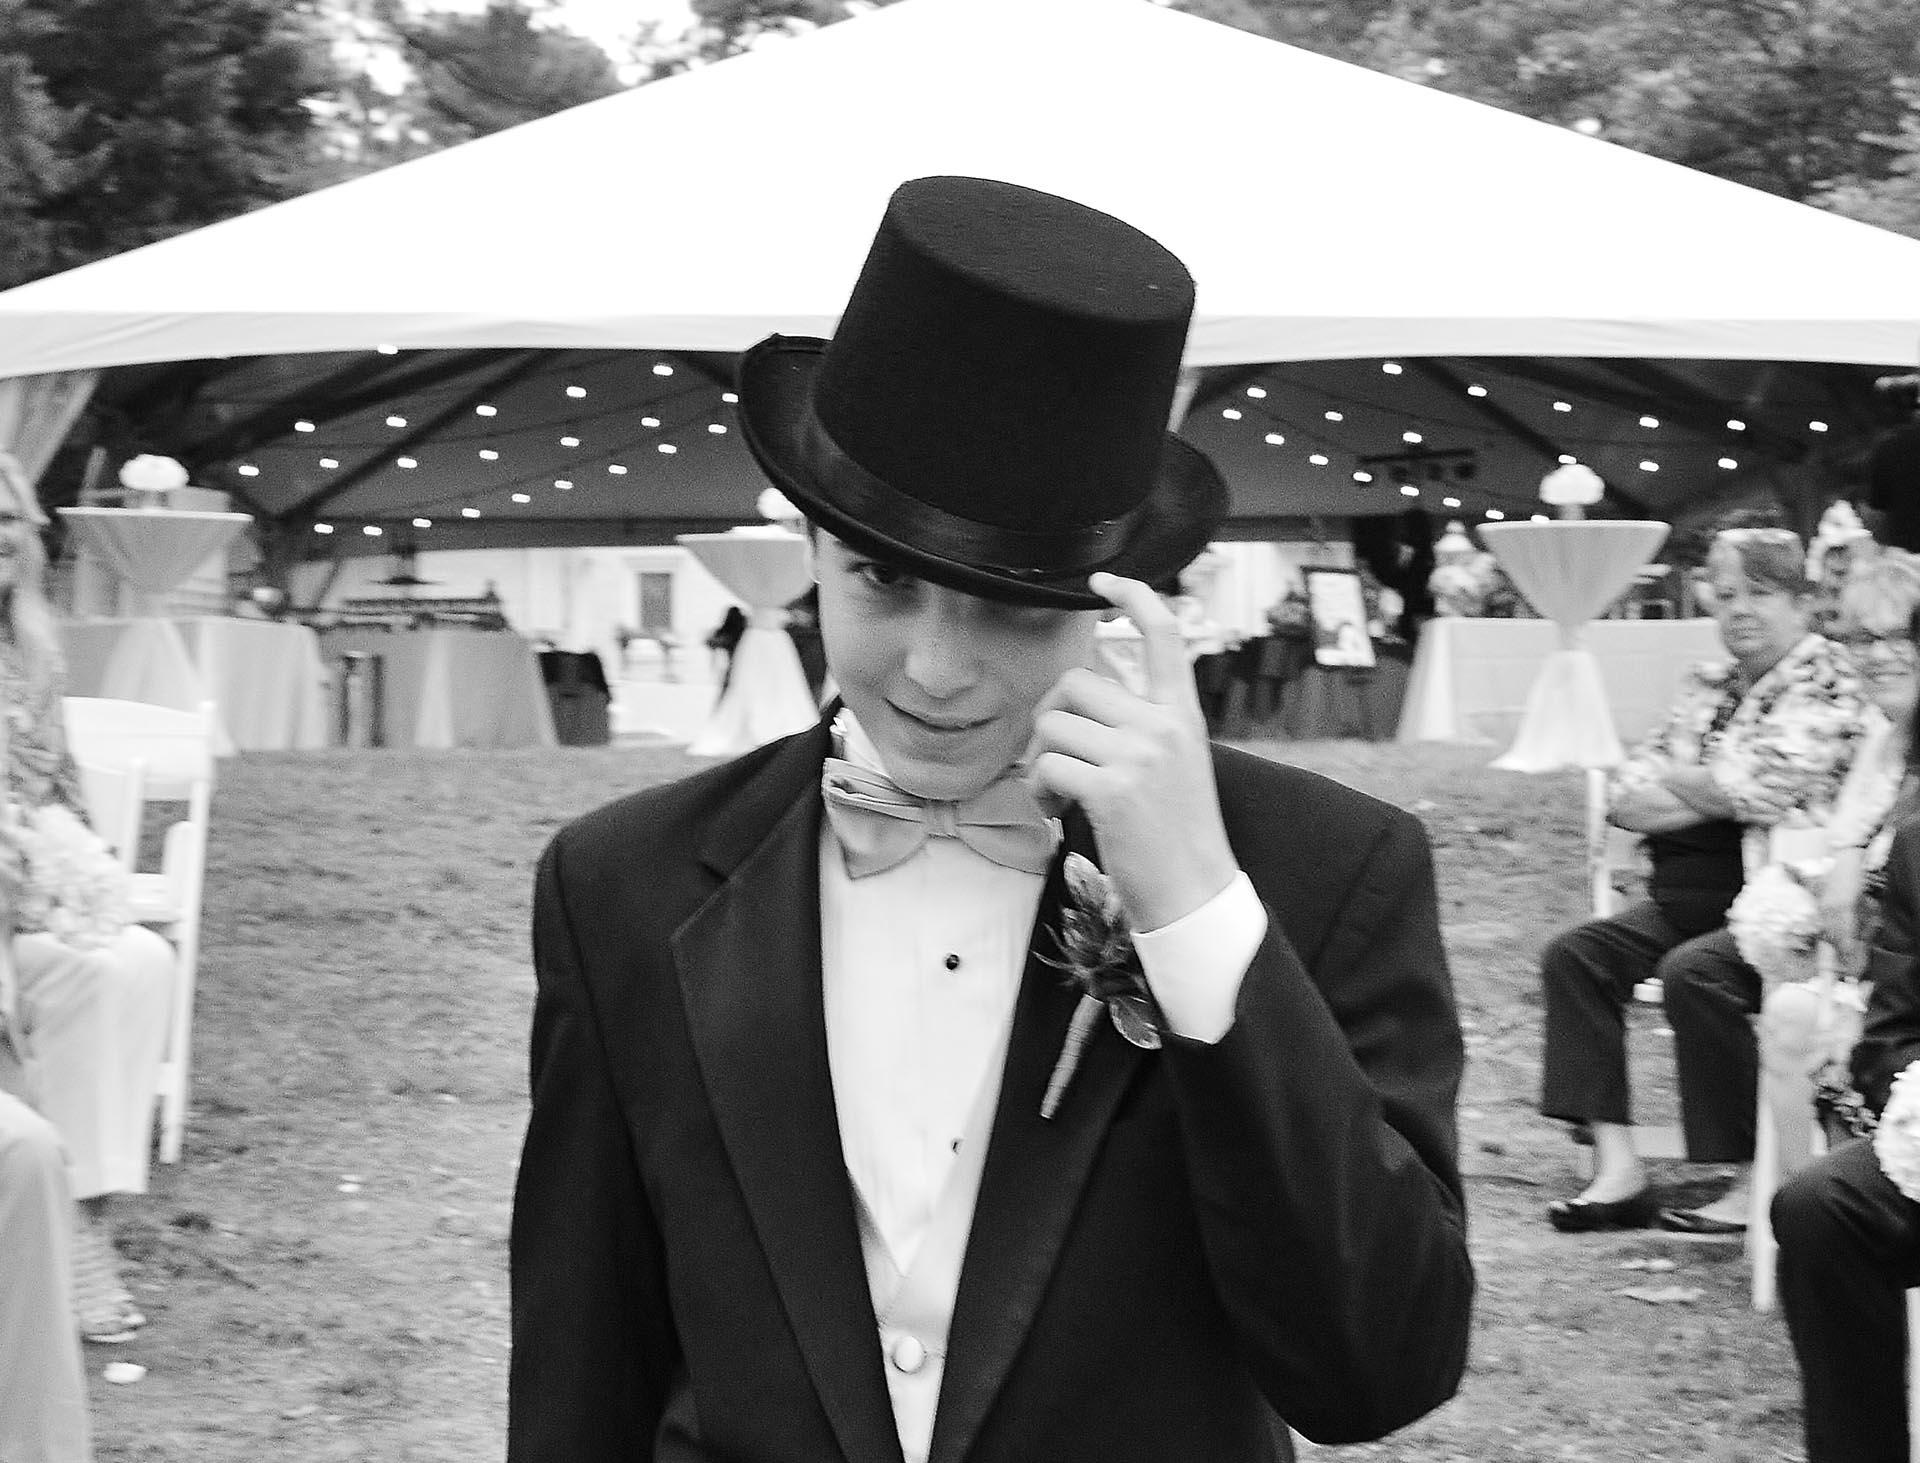 Groomsman at the wedding